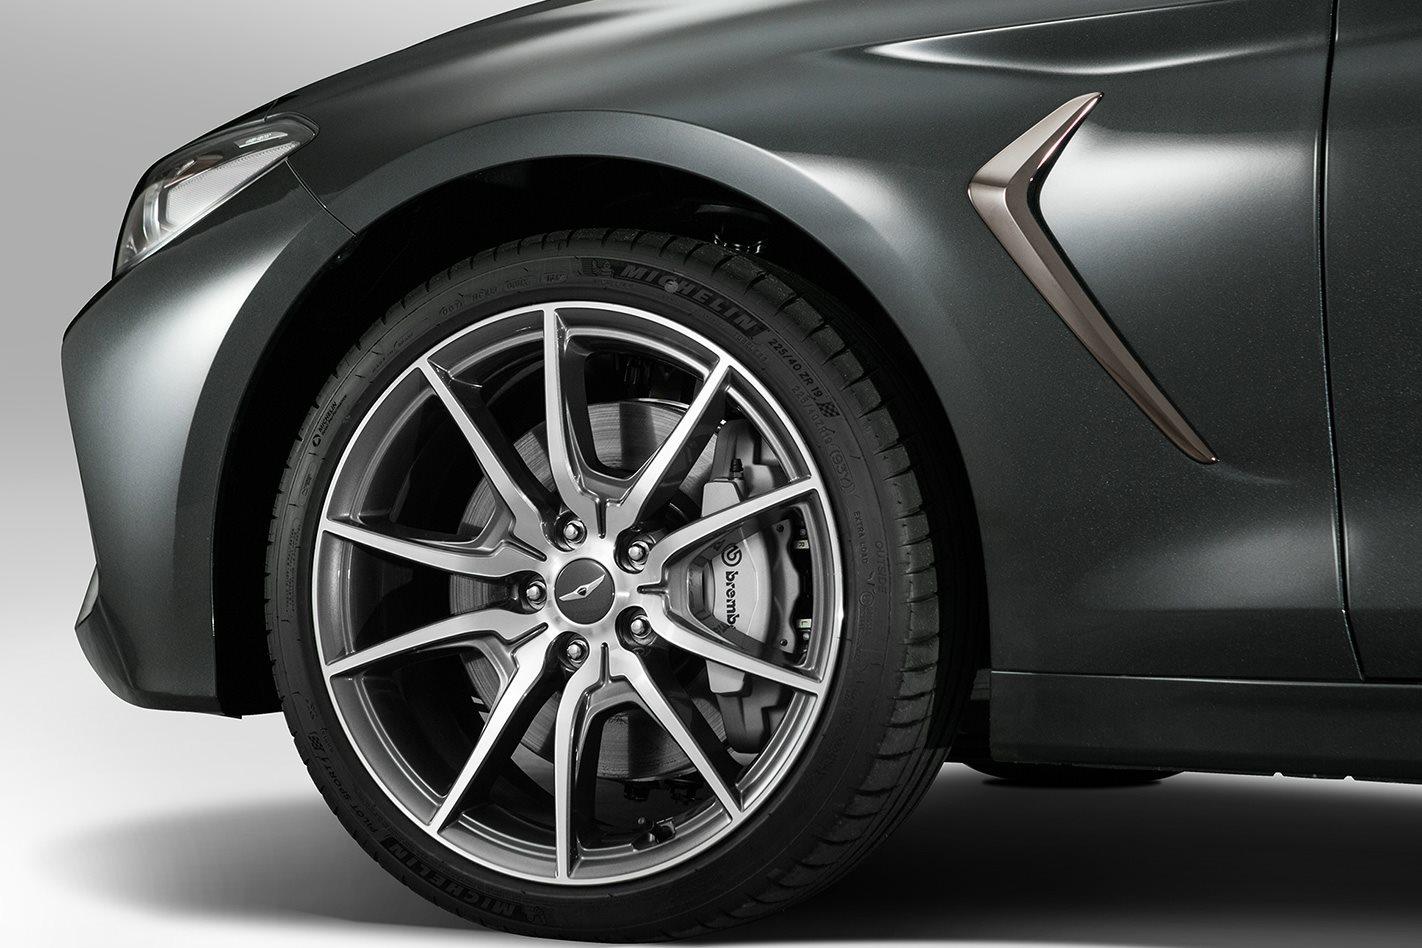 2018 Hyundai Genesis G70 wheel